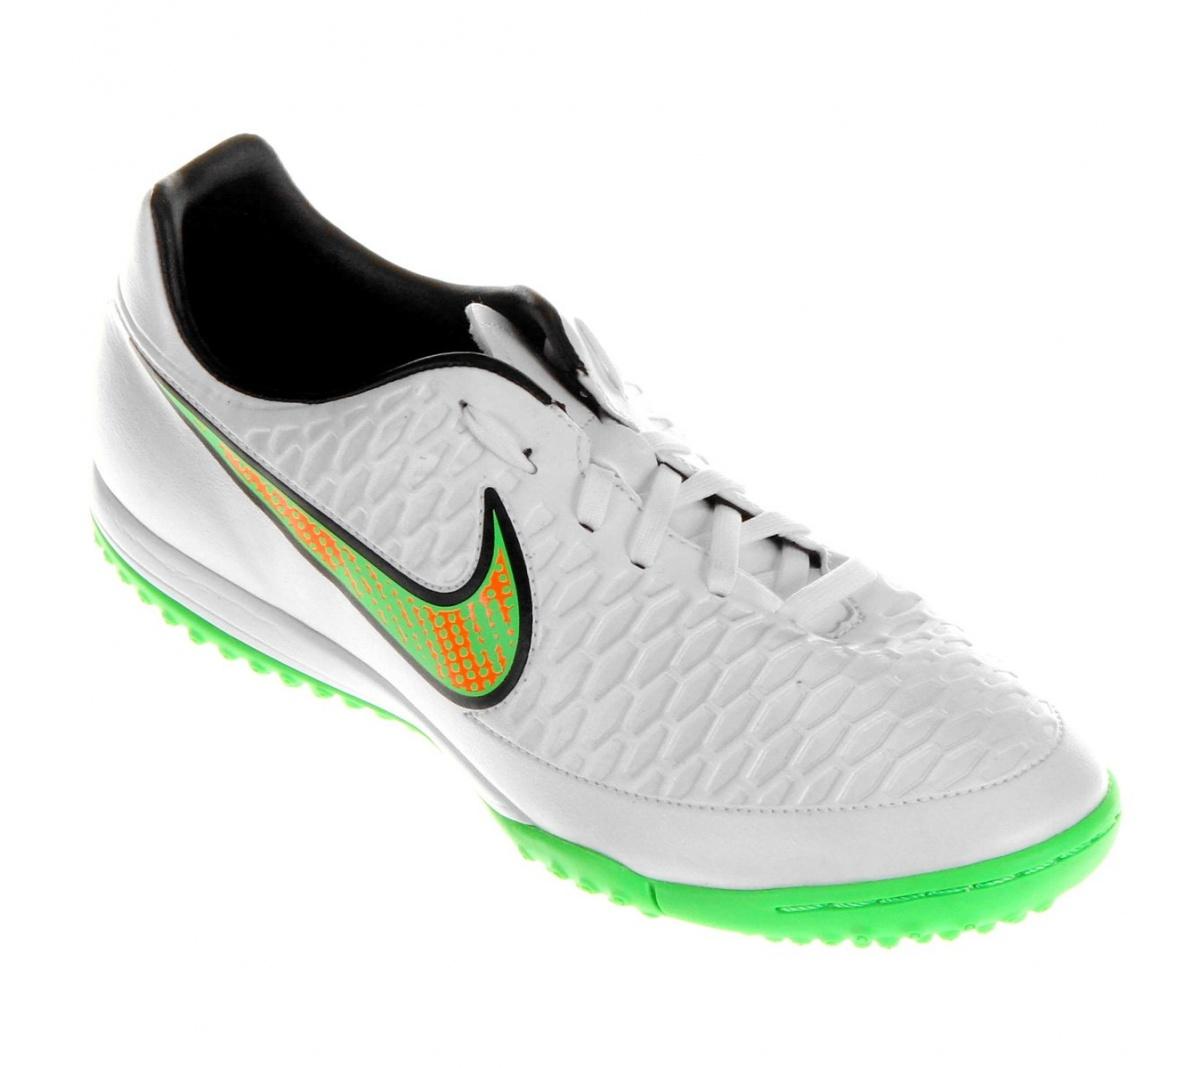 Chuteira Nike Magista Onda II Society Chuteira Nike Magista Onda II Society  ... 7e4708f639757